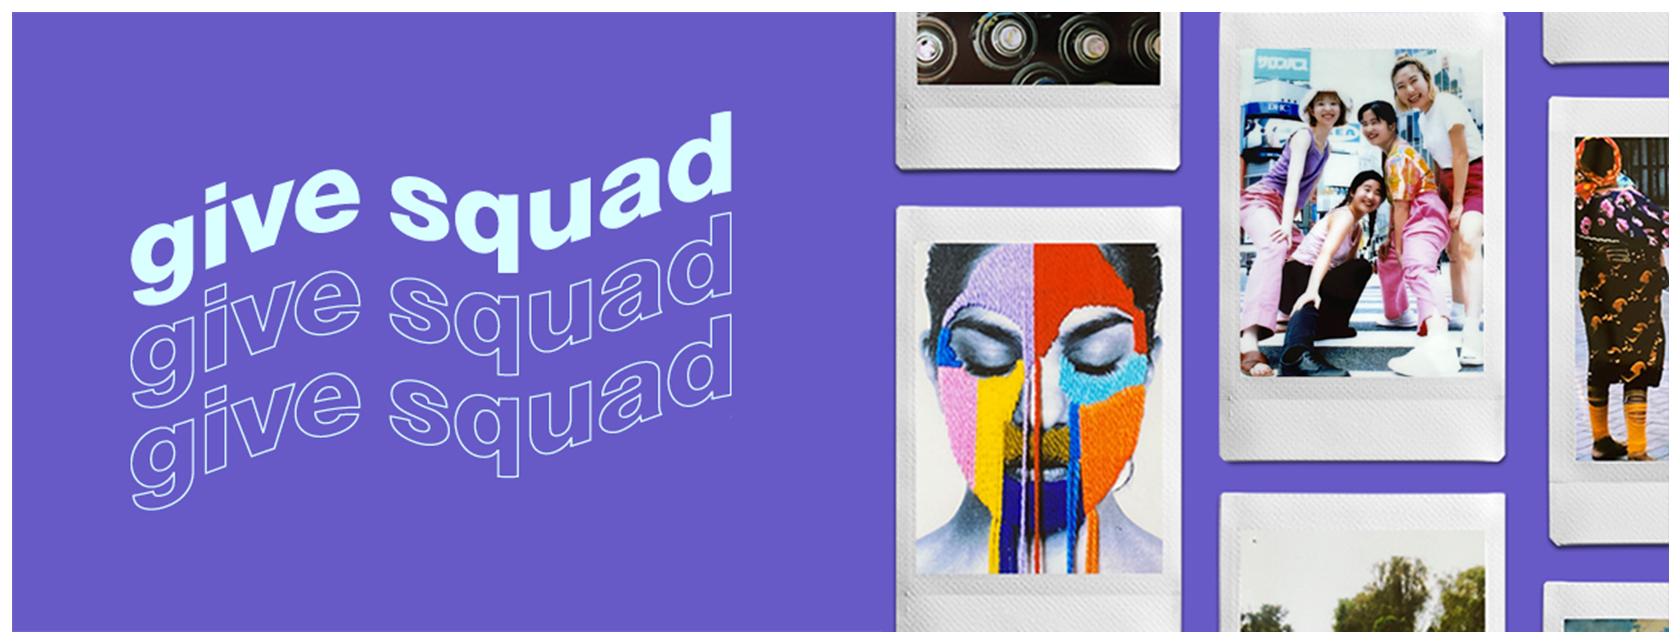 [Image]give squad